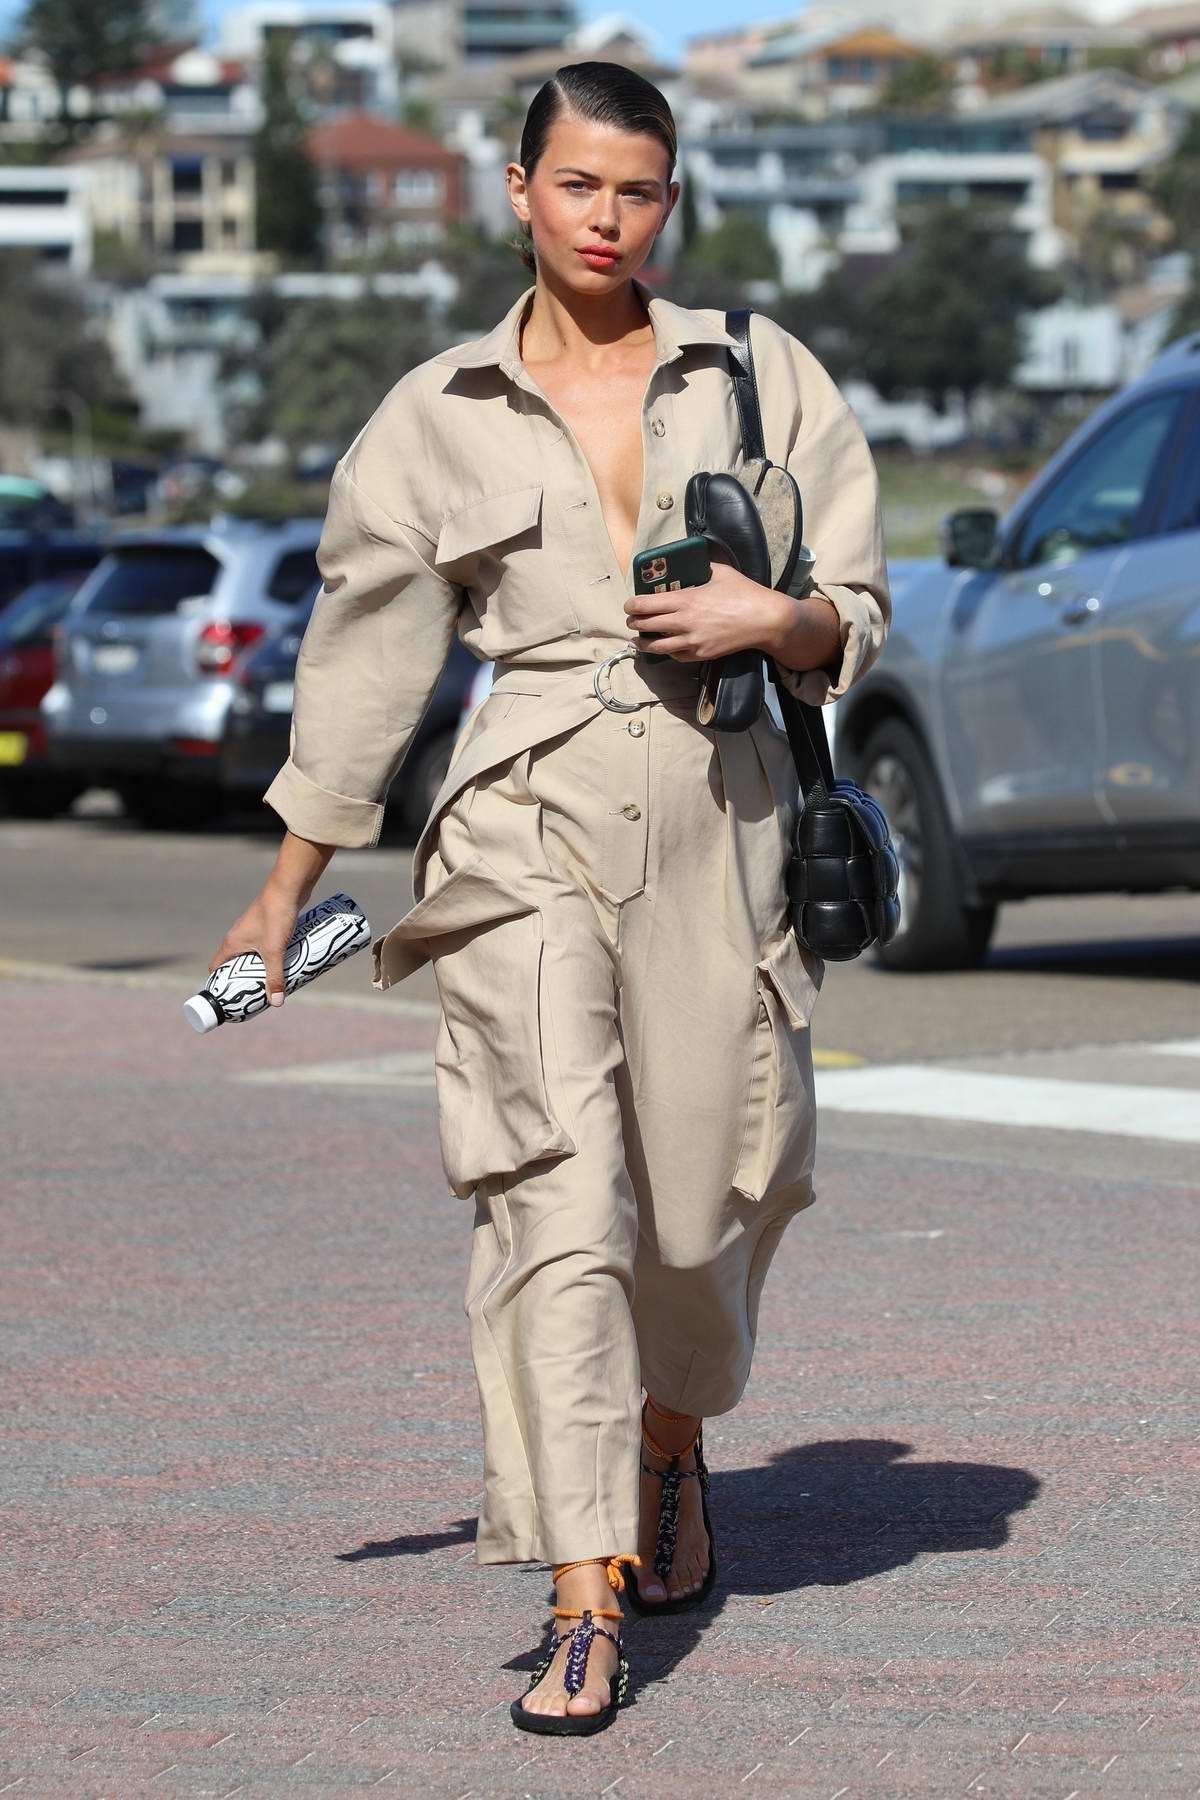 Georgia Fowler looks chic in a beige jumpsuit while out in Bondi, Australia